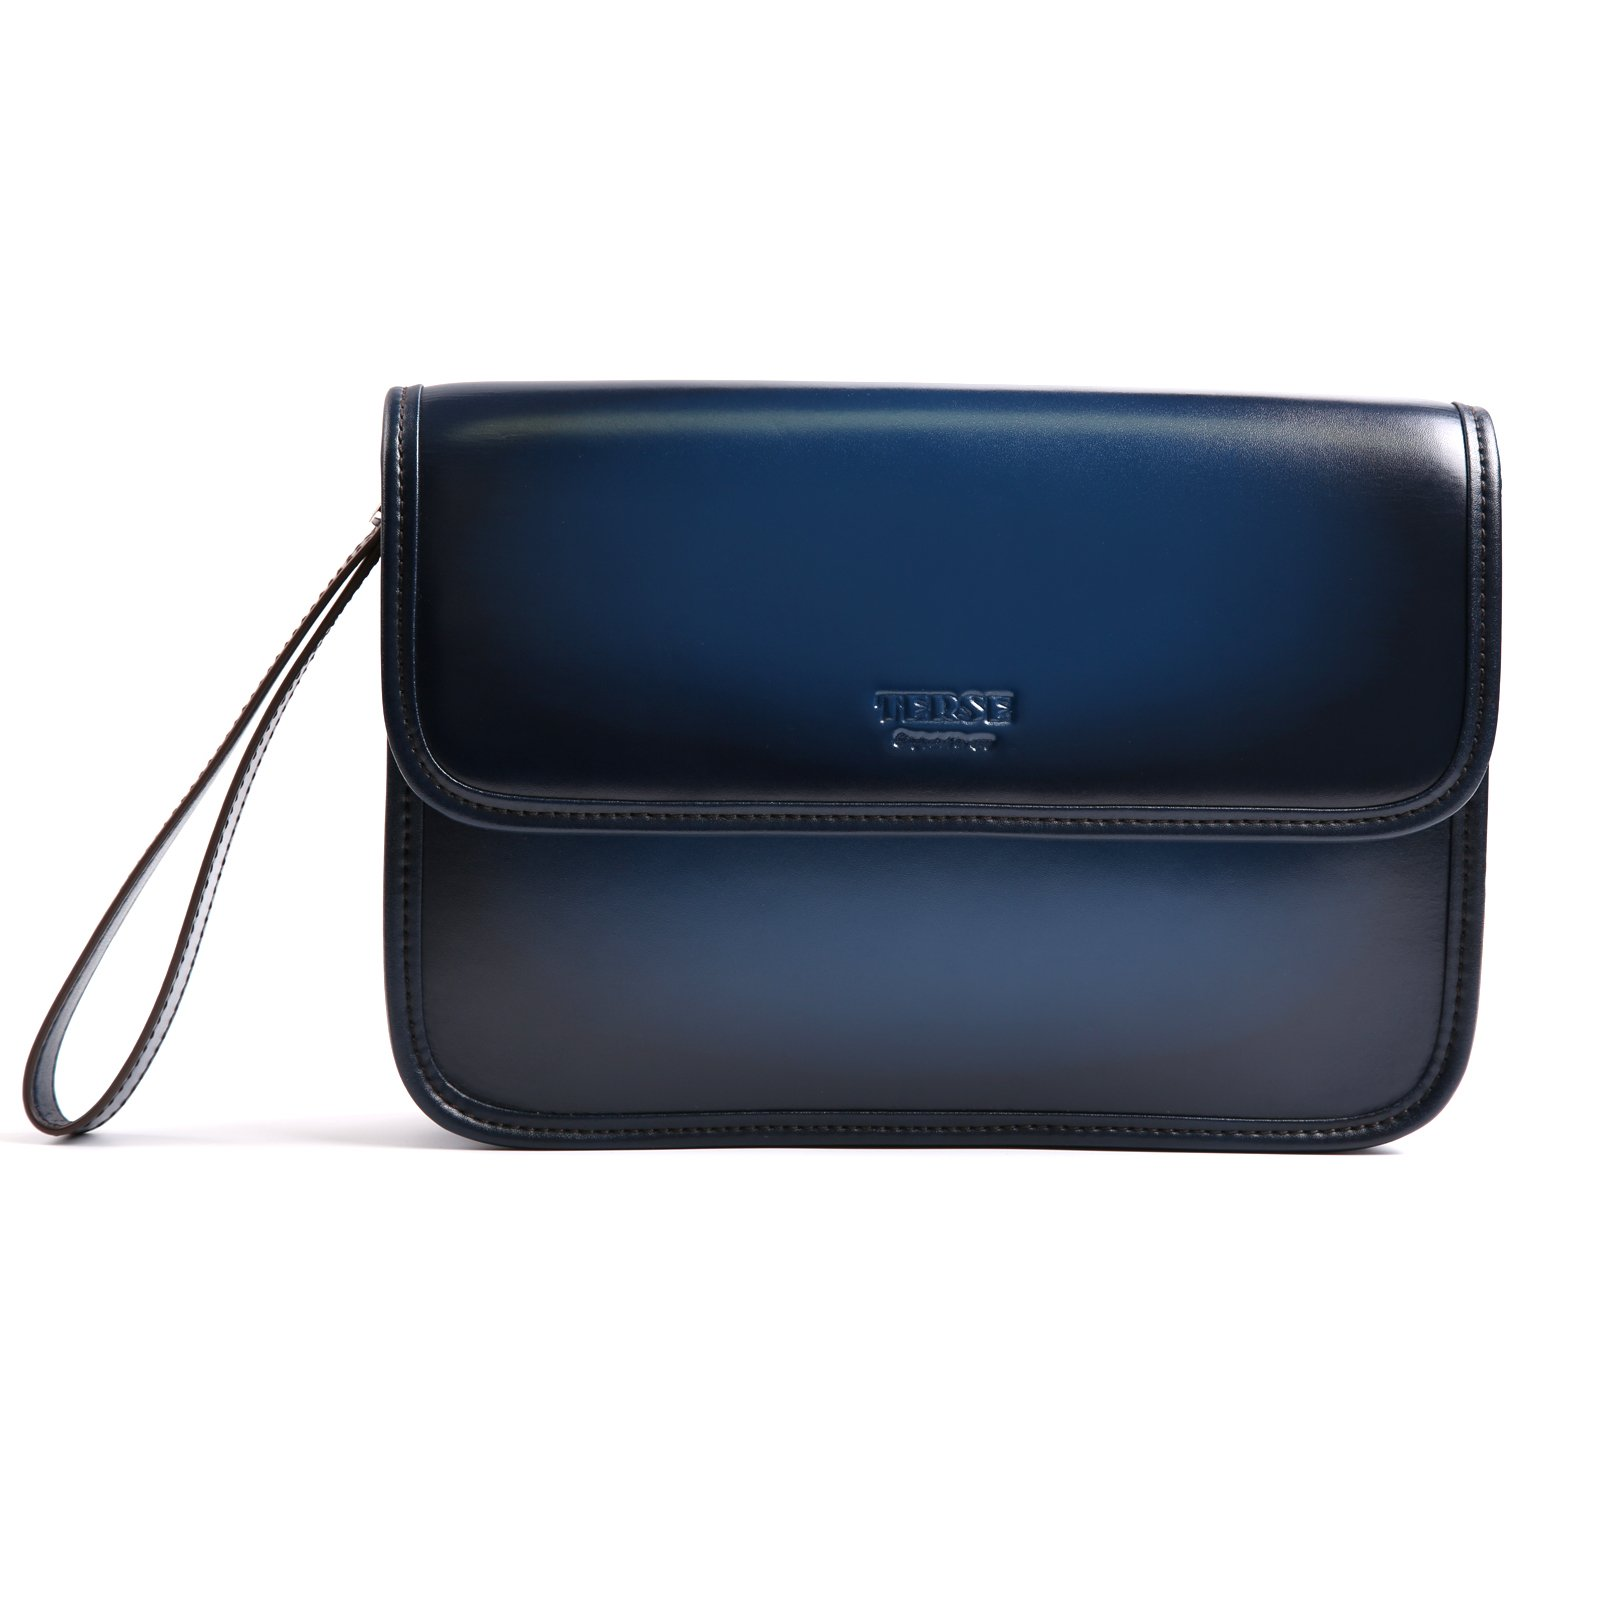 TERSE Genuine Leather Clutch Bag Handmade Wristlet Card Cash Holder Business Handbag Zipper Wallets Manual Brush-off(Blue) TS615E